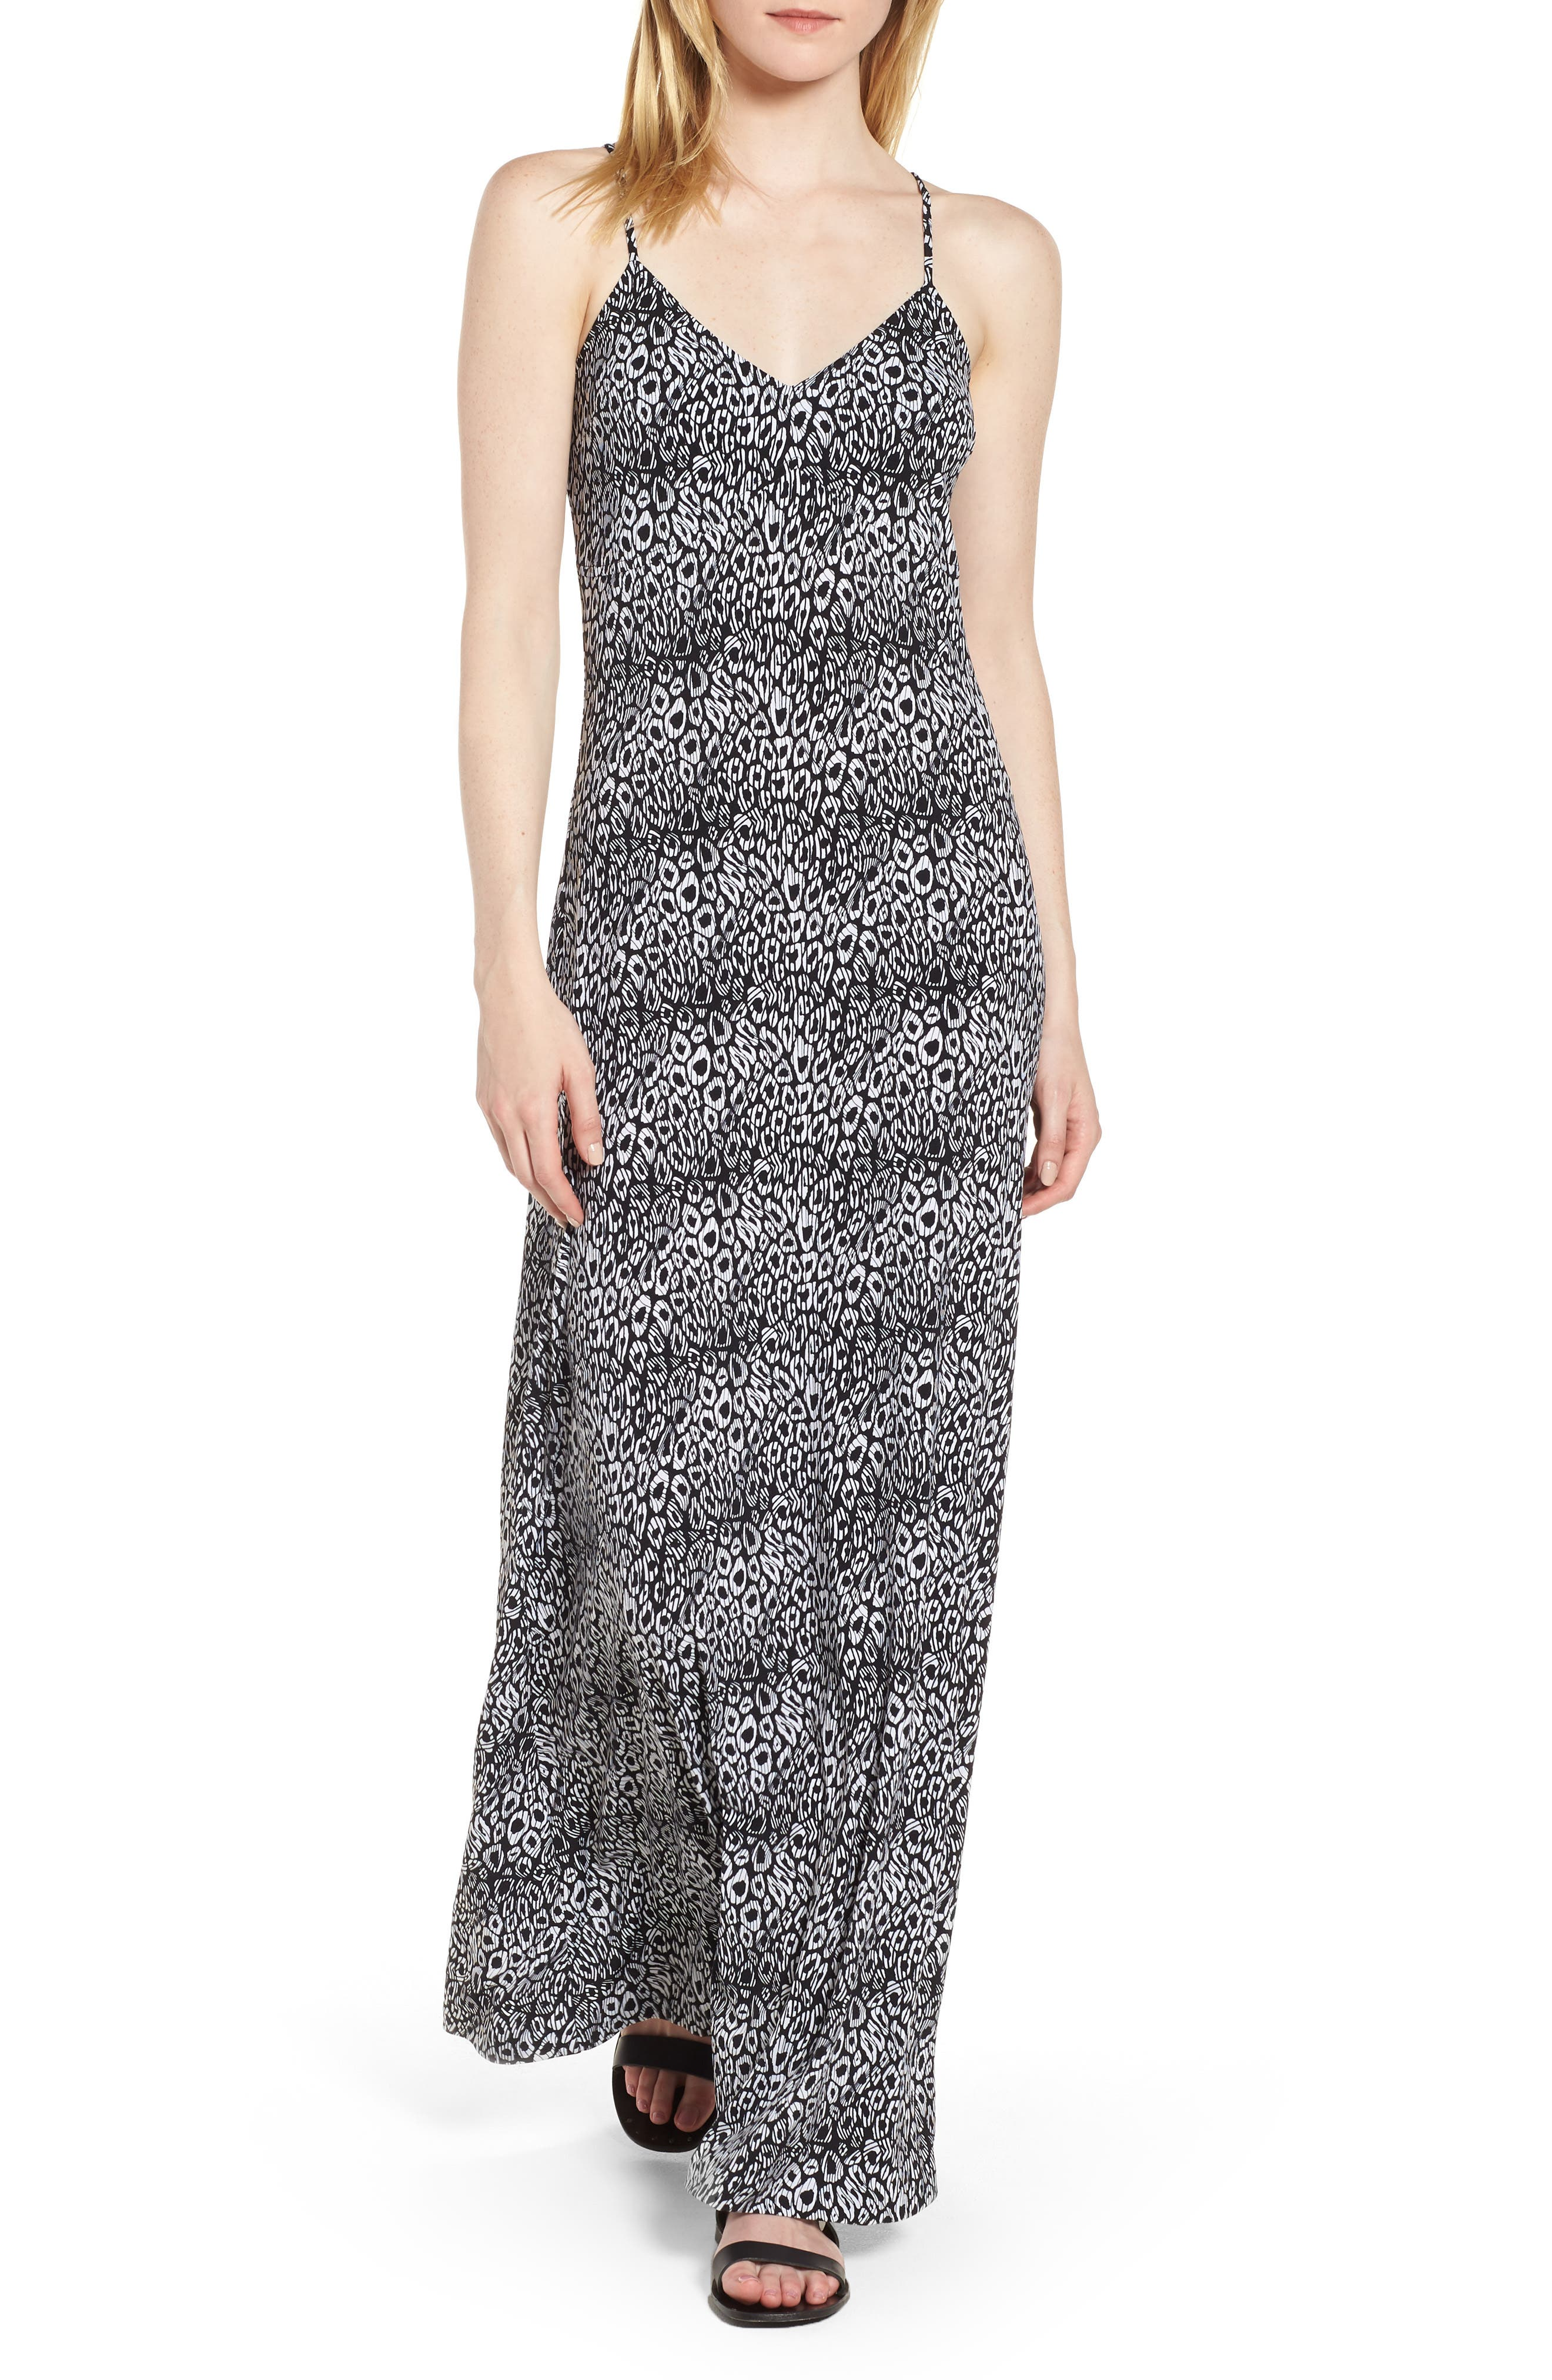 Wavy Leopard Print Tank Maxi Dress,                             Main thumbnail 1, color,                             Black/ White